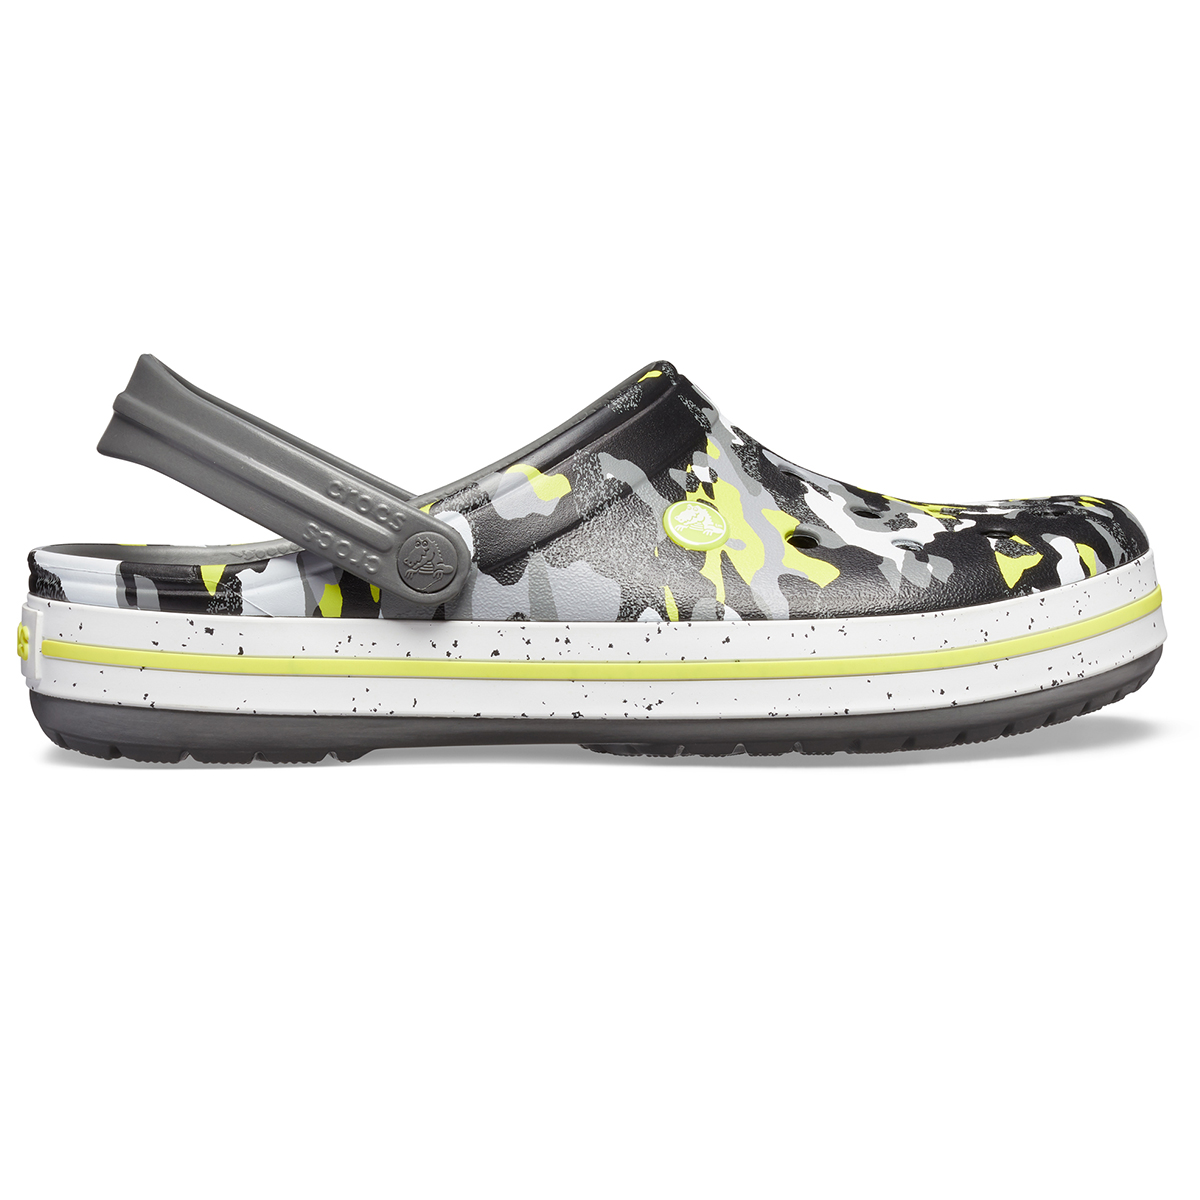 Crocs Crocband Graphic III Clog - Kamuflaj/Grafit